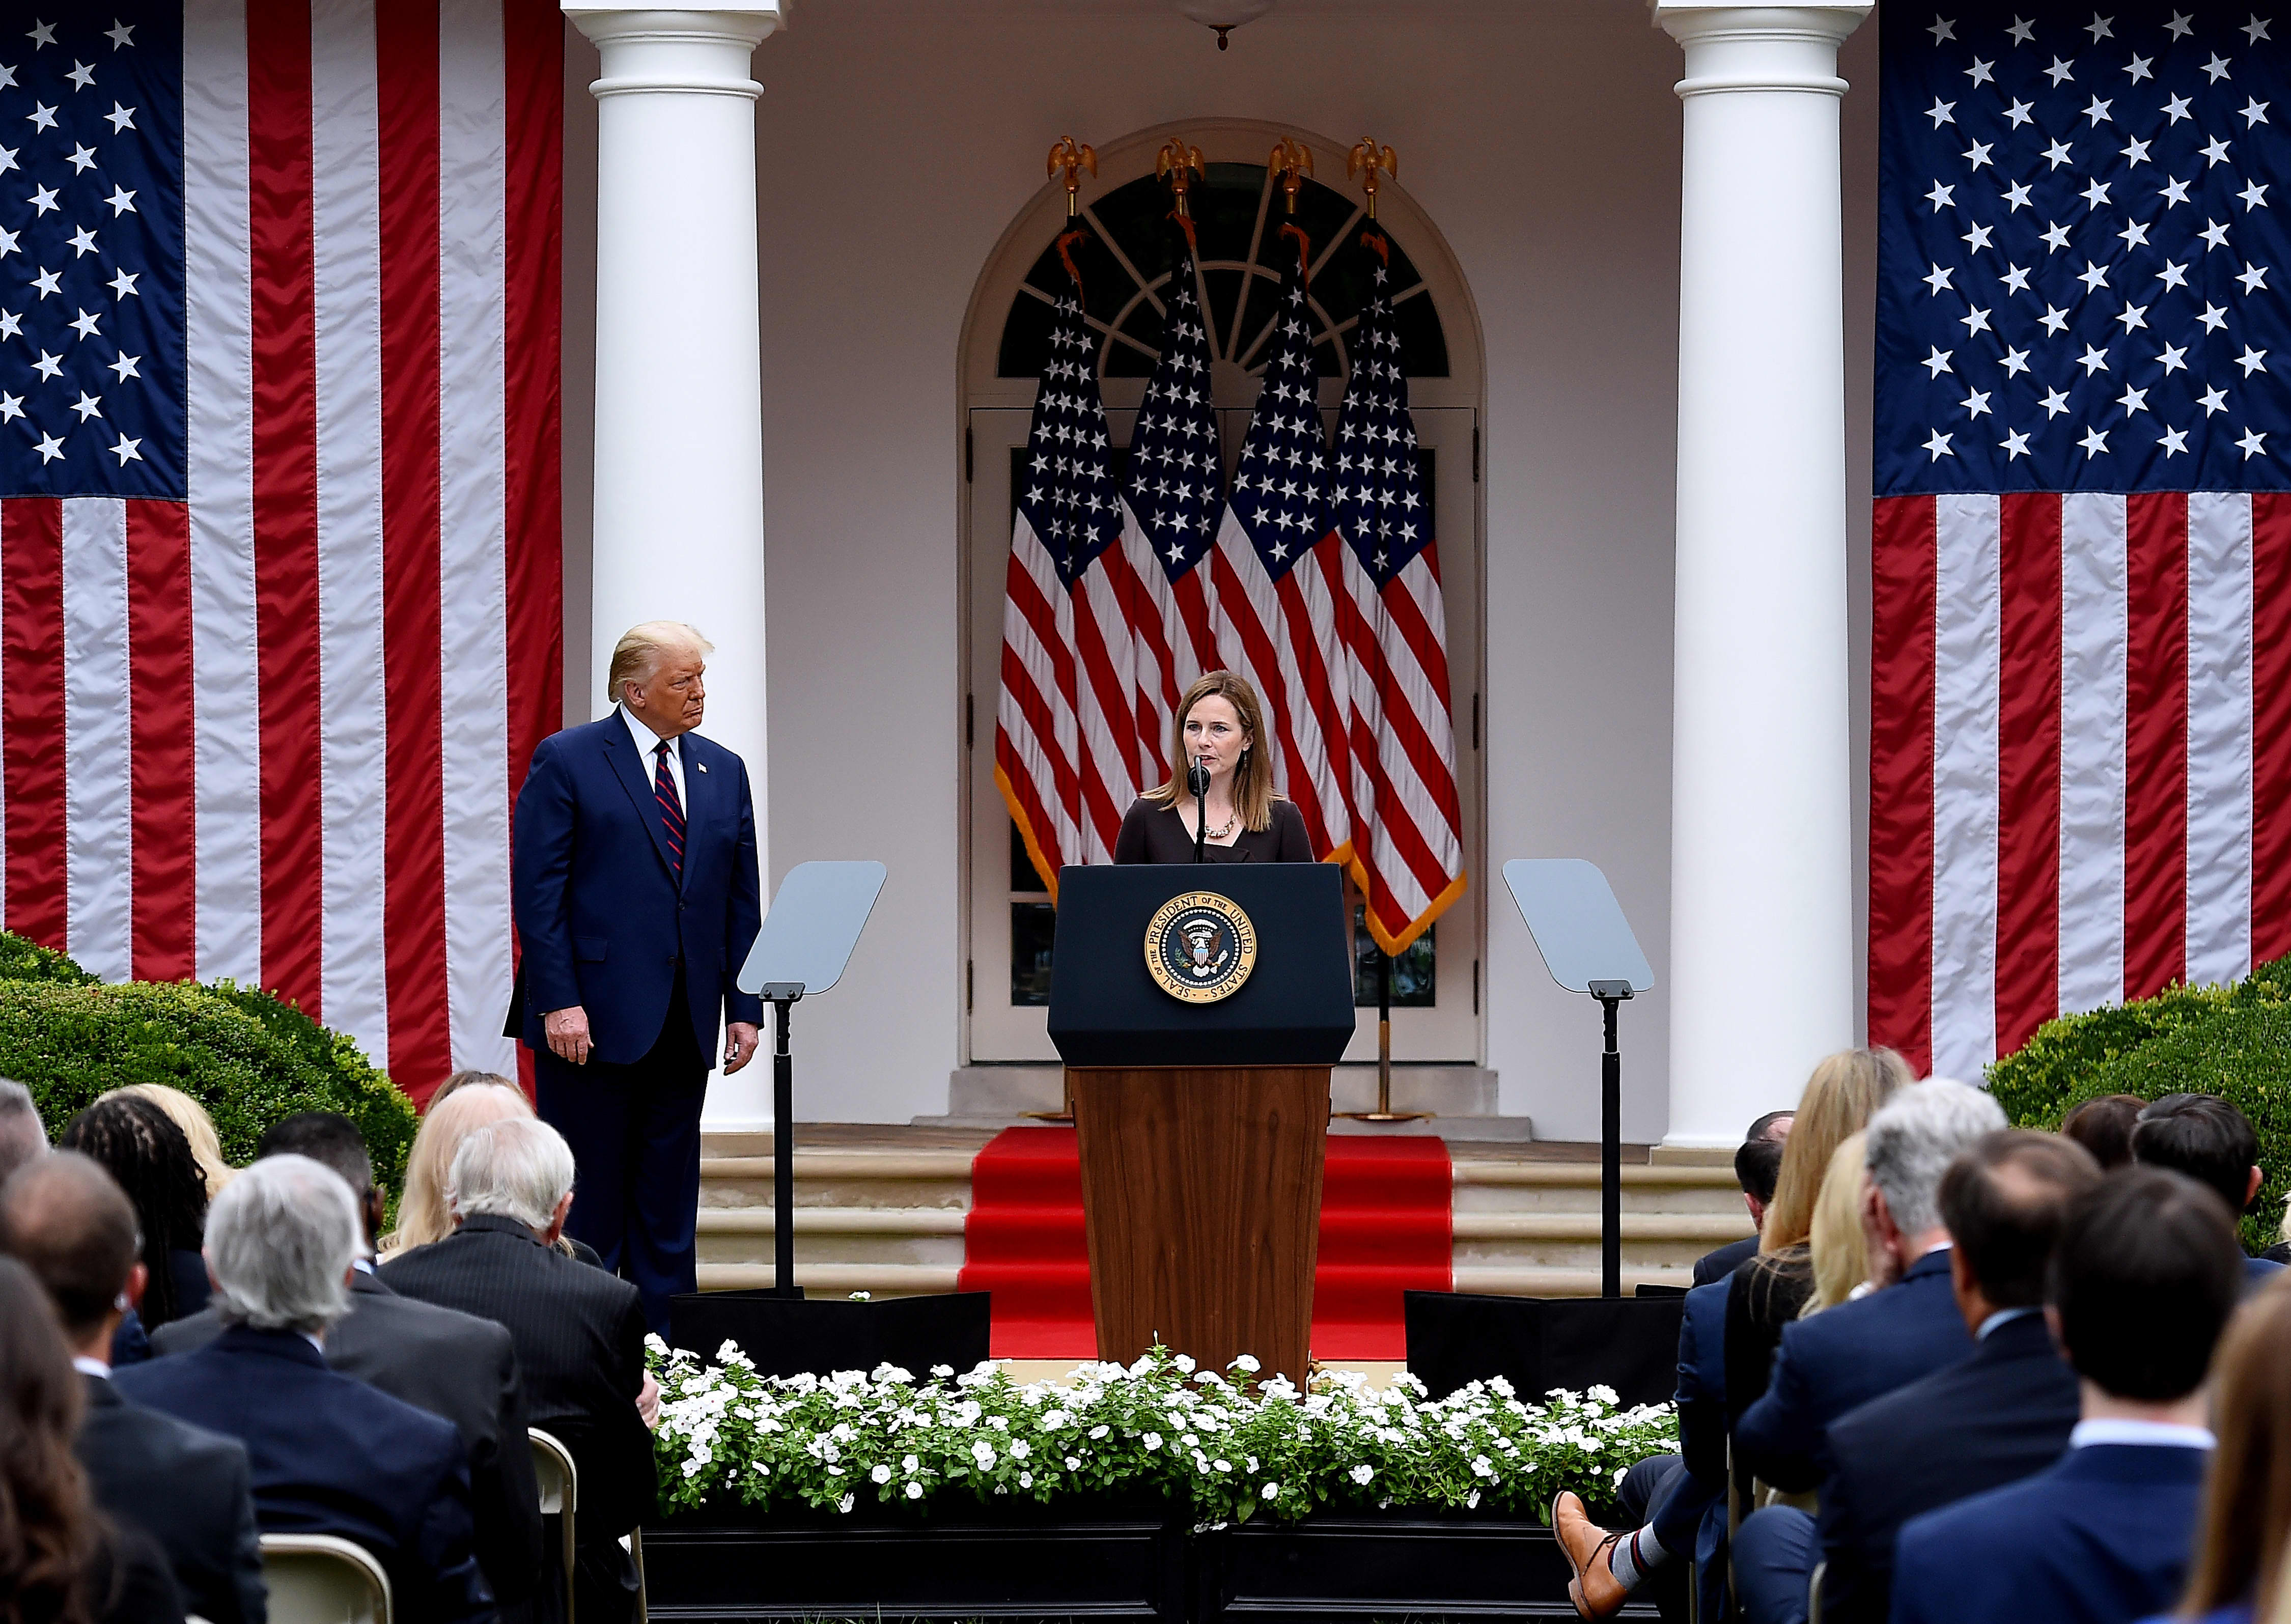 Democrats seek to turn Supreme Court fight into referendum on Obamacare